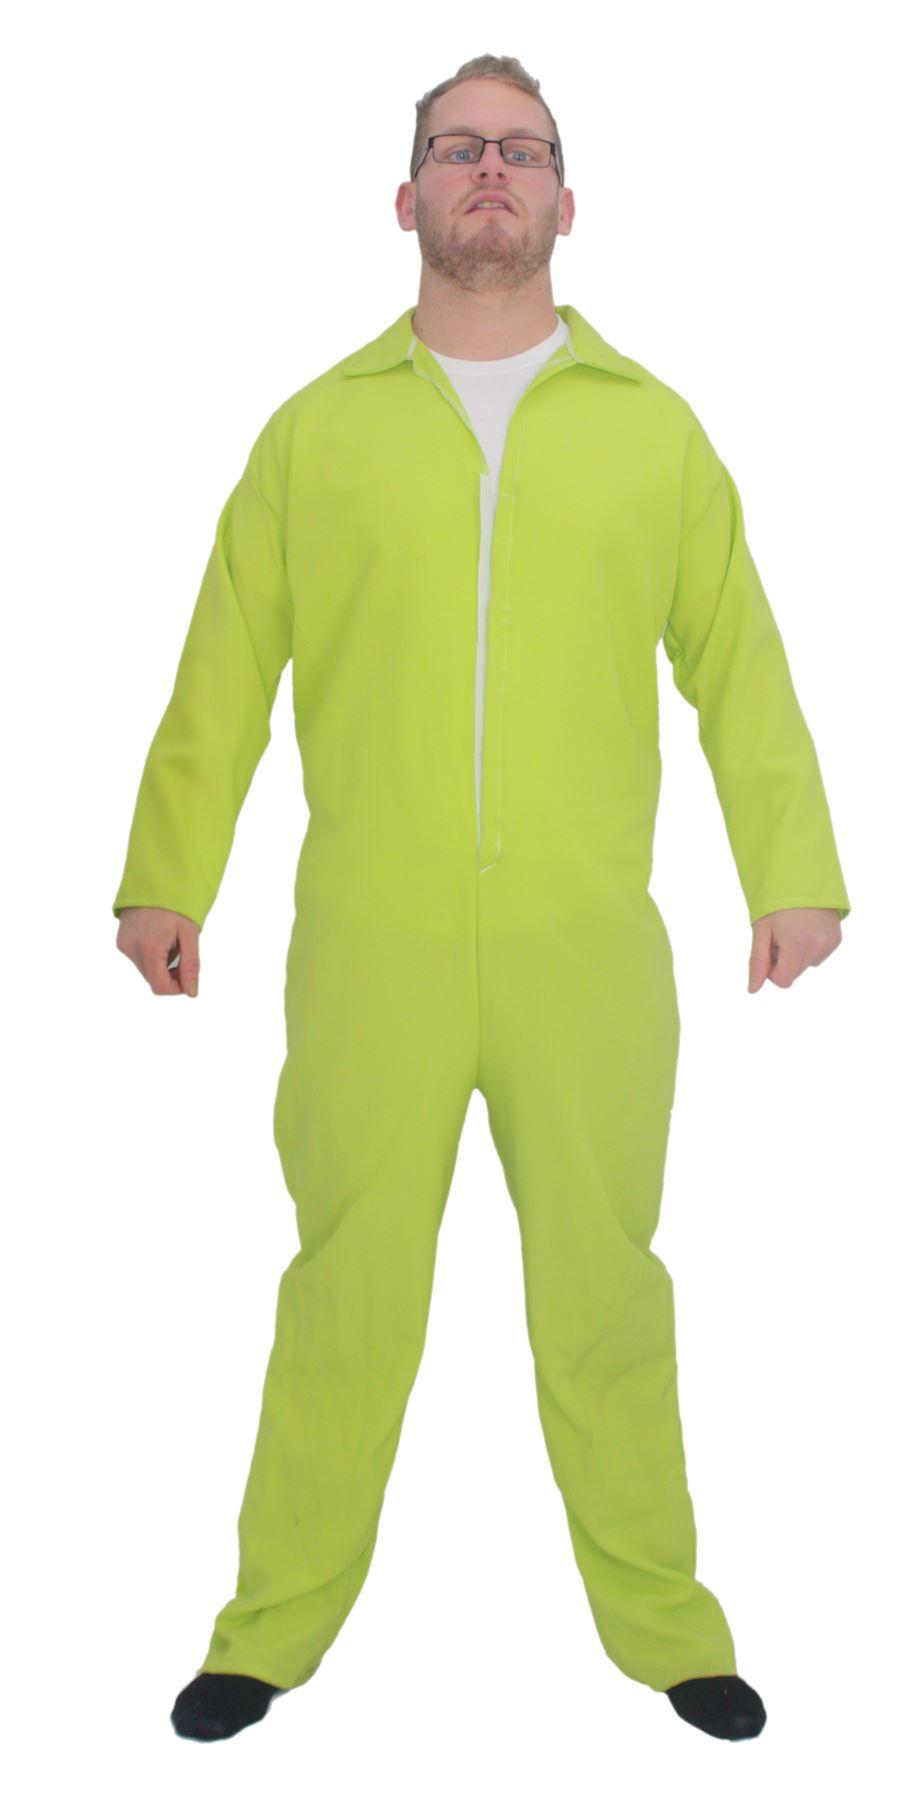 b46faae238 Adults Neon Yellow Plain Overalls Mechanic Boilersuit Fancy Dress